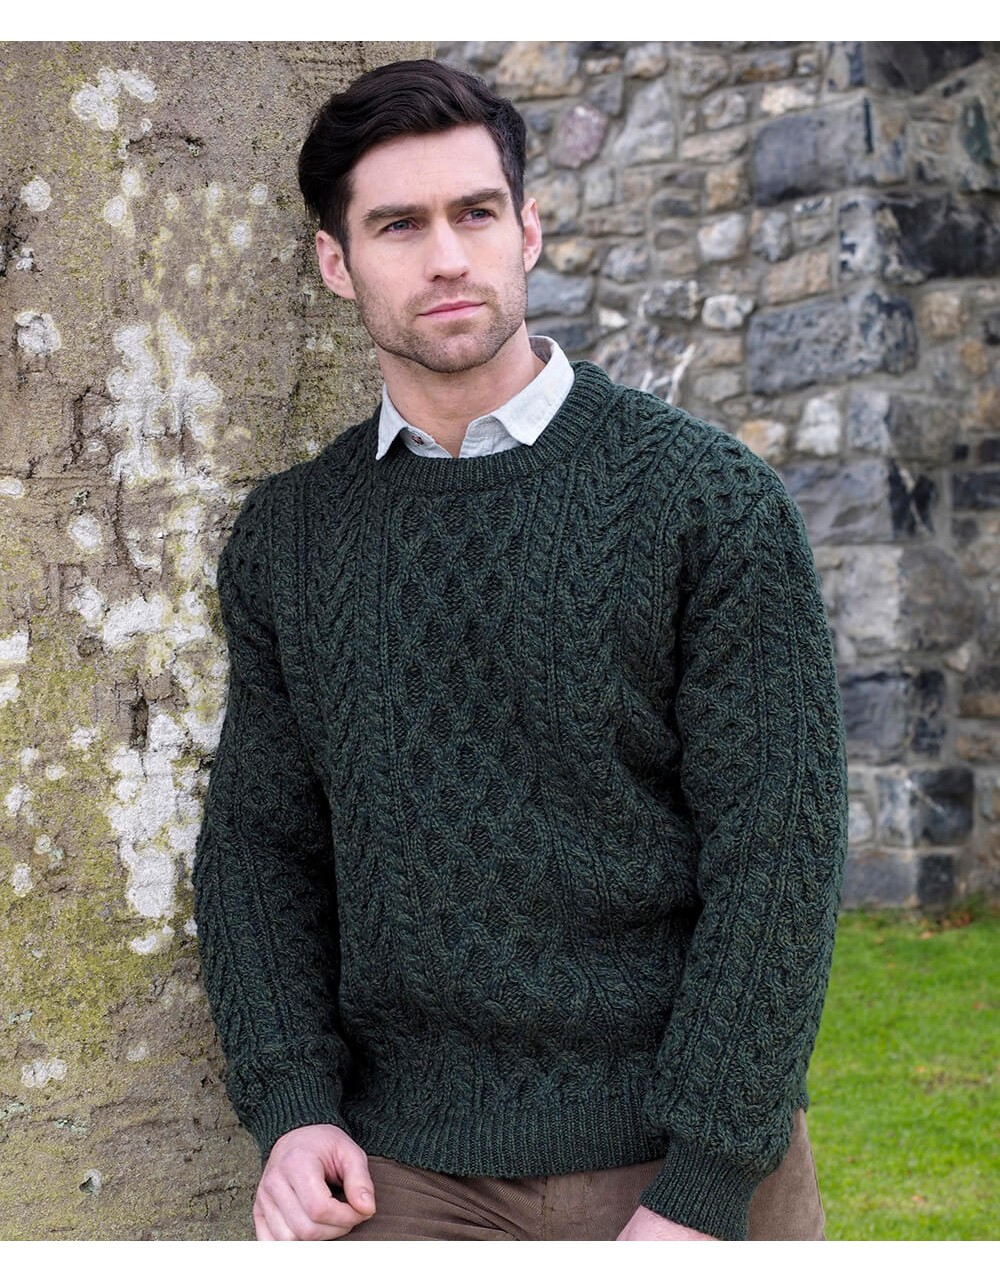 Sweater Aran Fisherman Crew Neck|Aran Sweaters Men|Irish Handcrafts